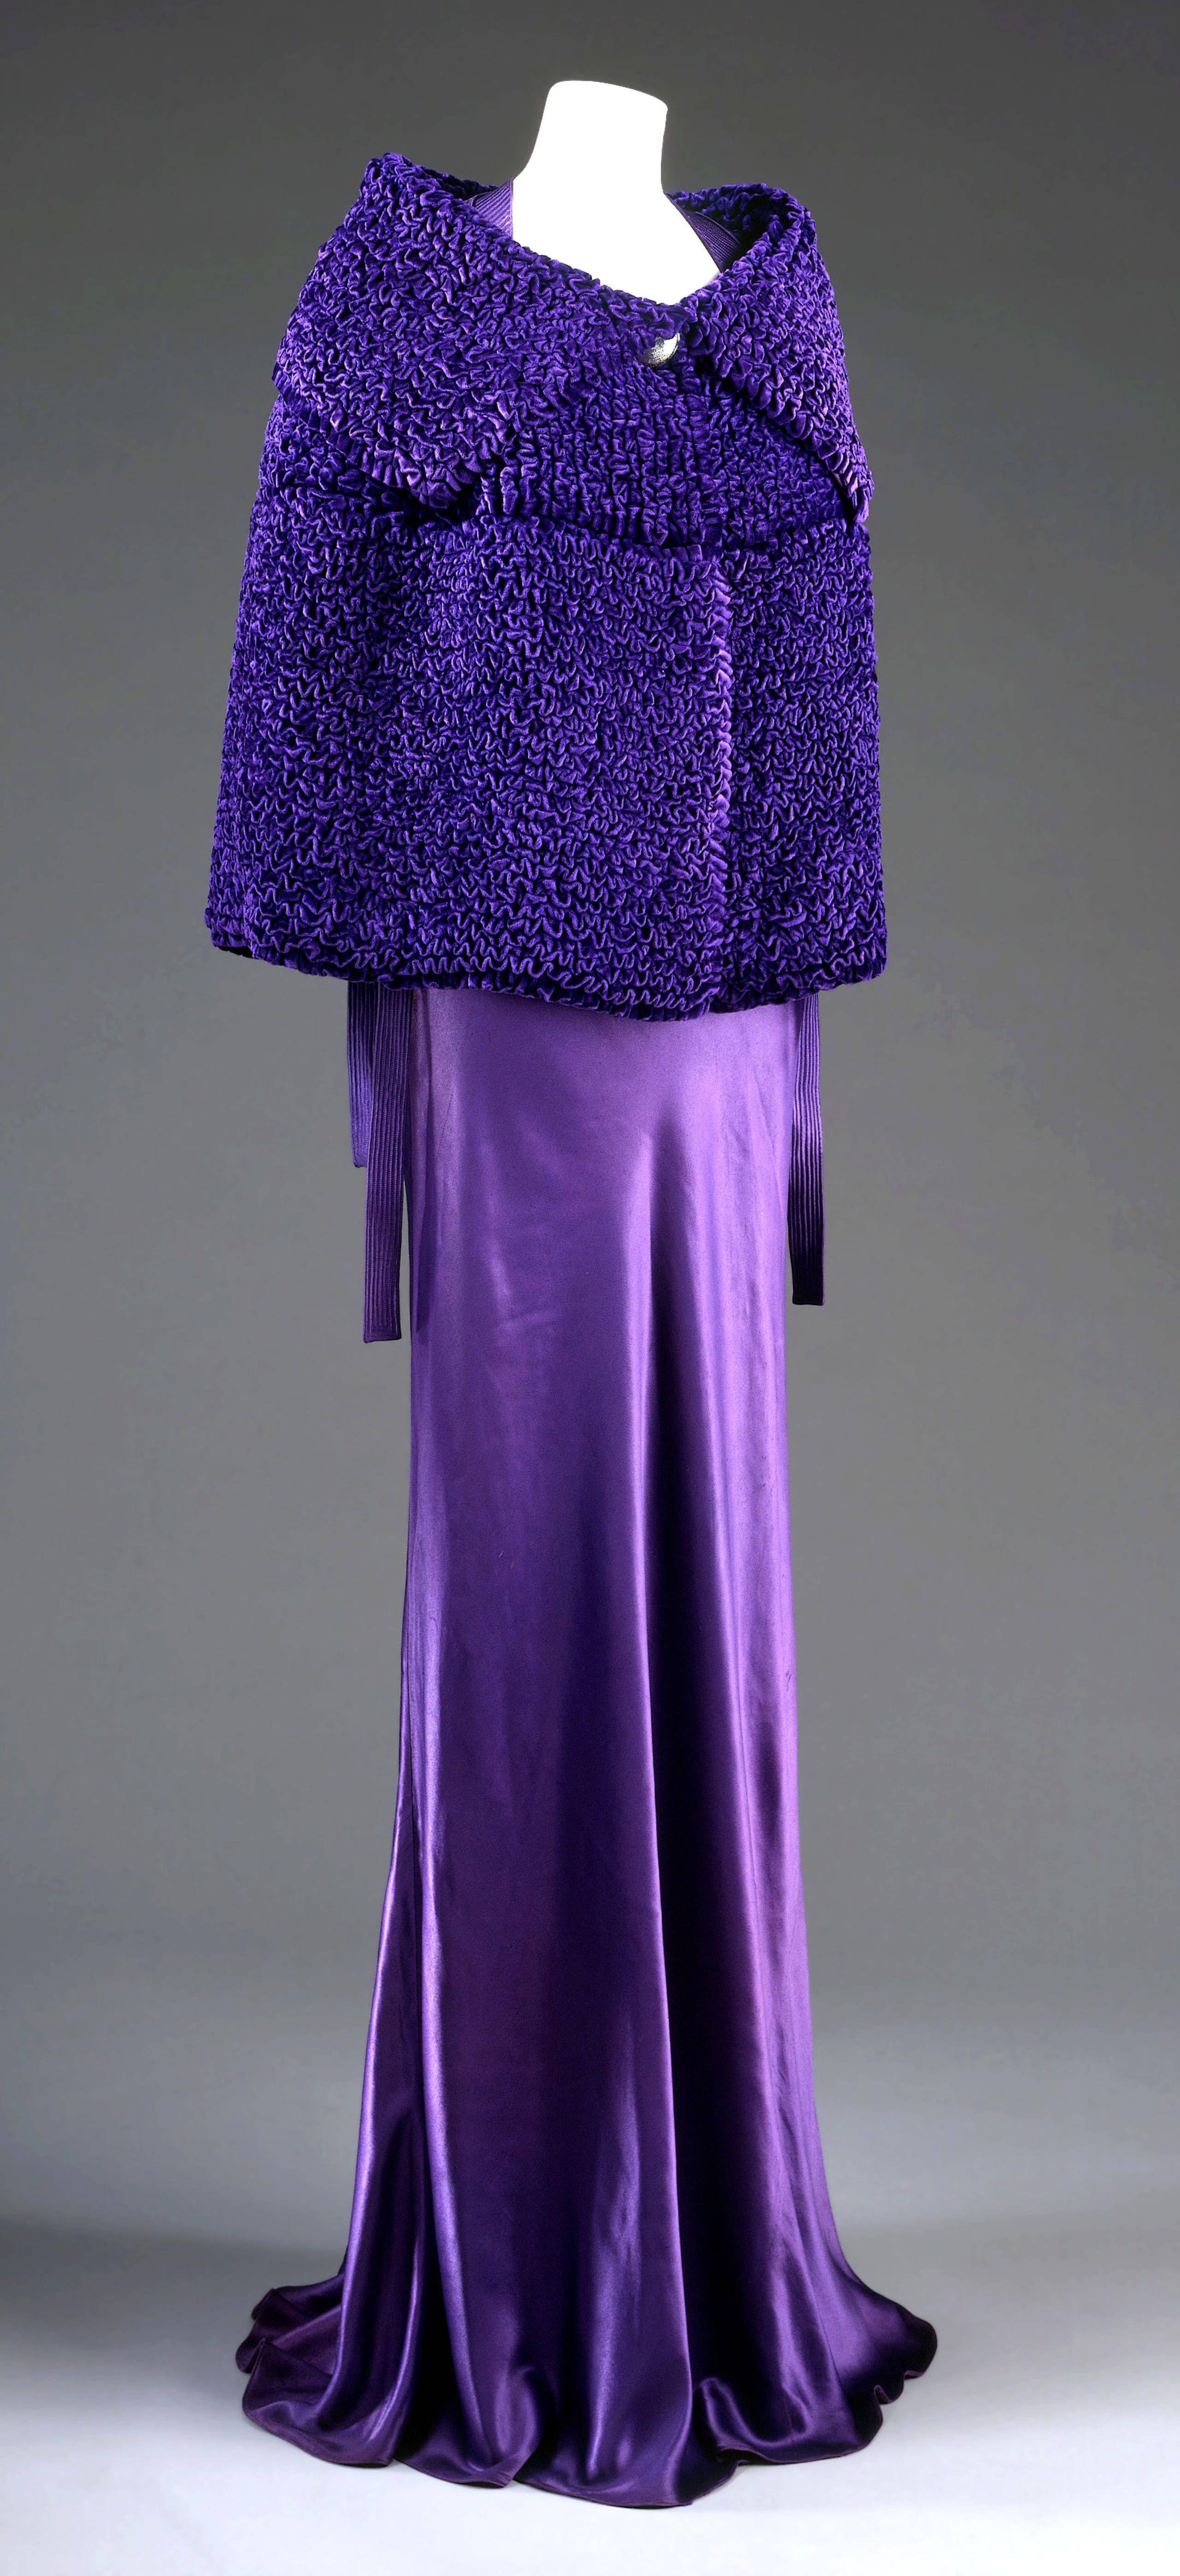 Dorable 1890 Vestidos De Novia Ideas Ornamento Elaboración ...